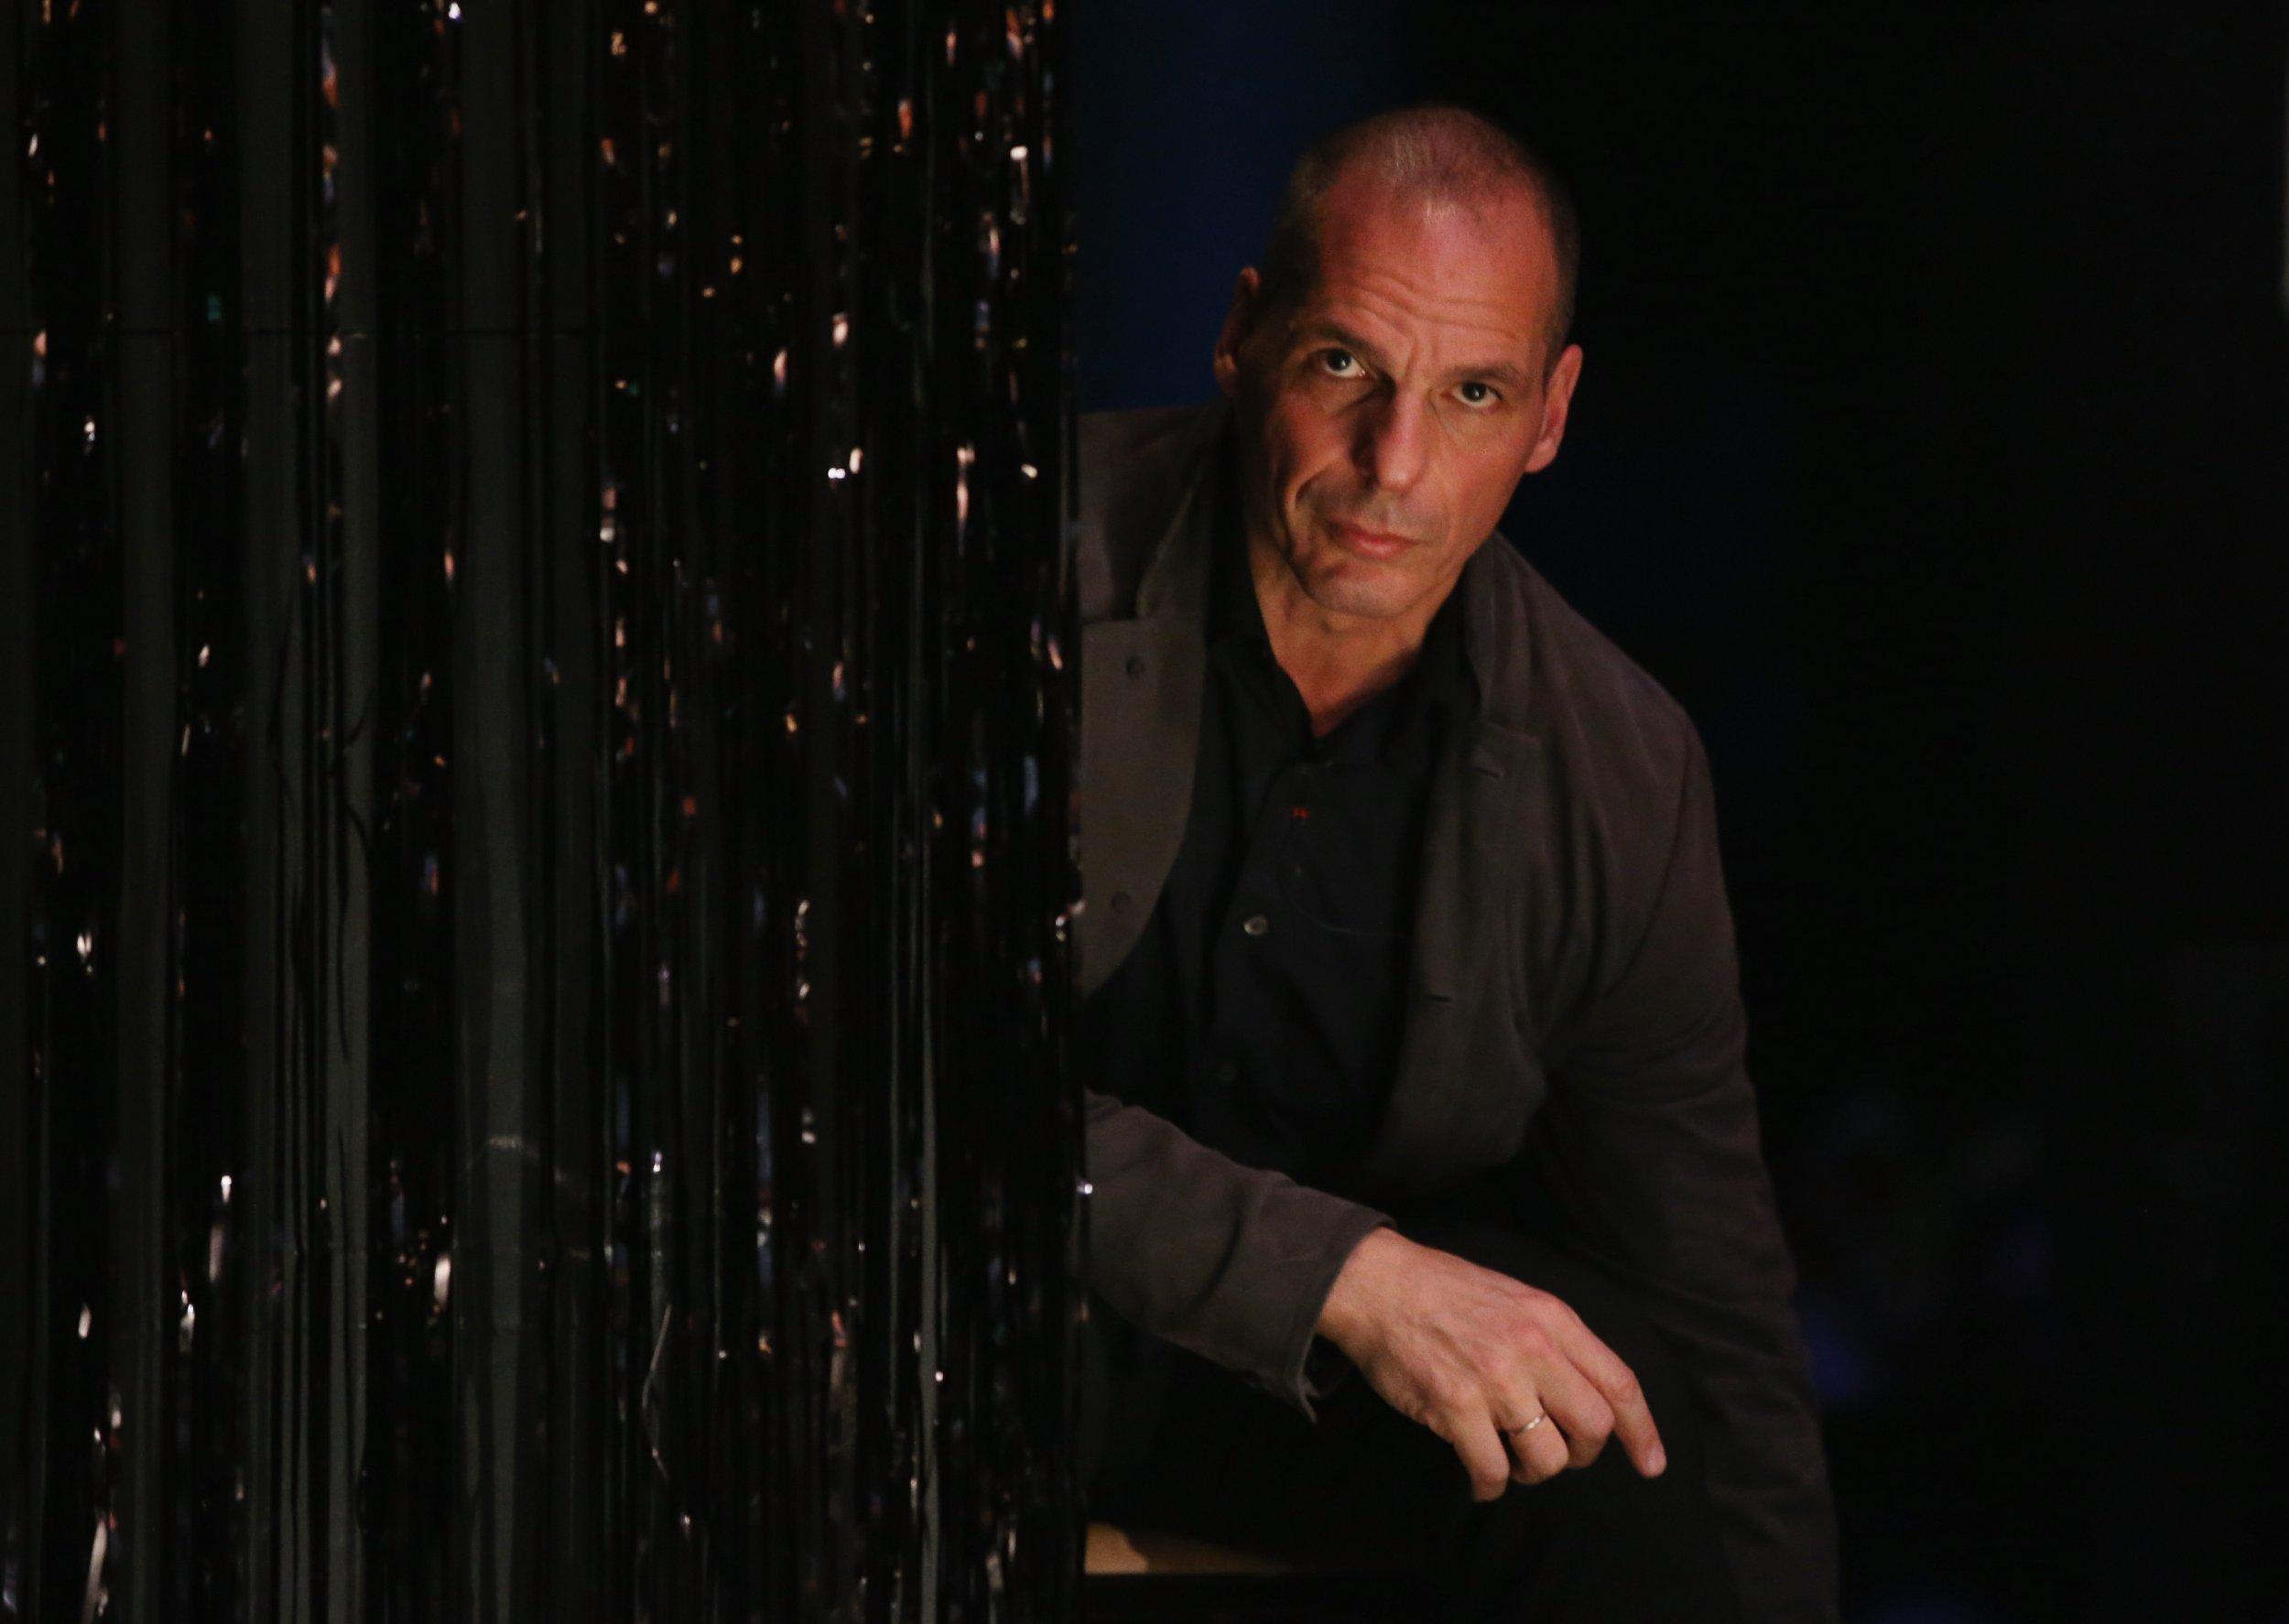 Yanis Varoufakis Diem25 launch